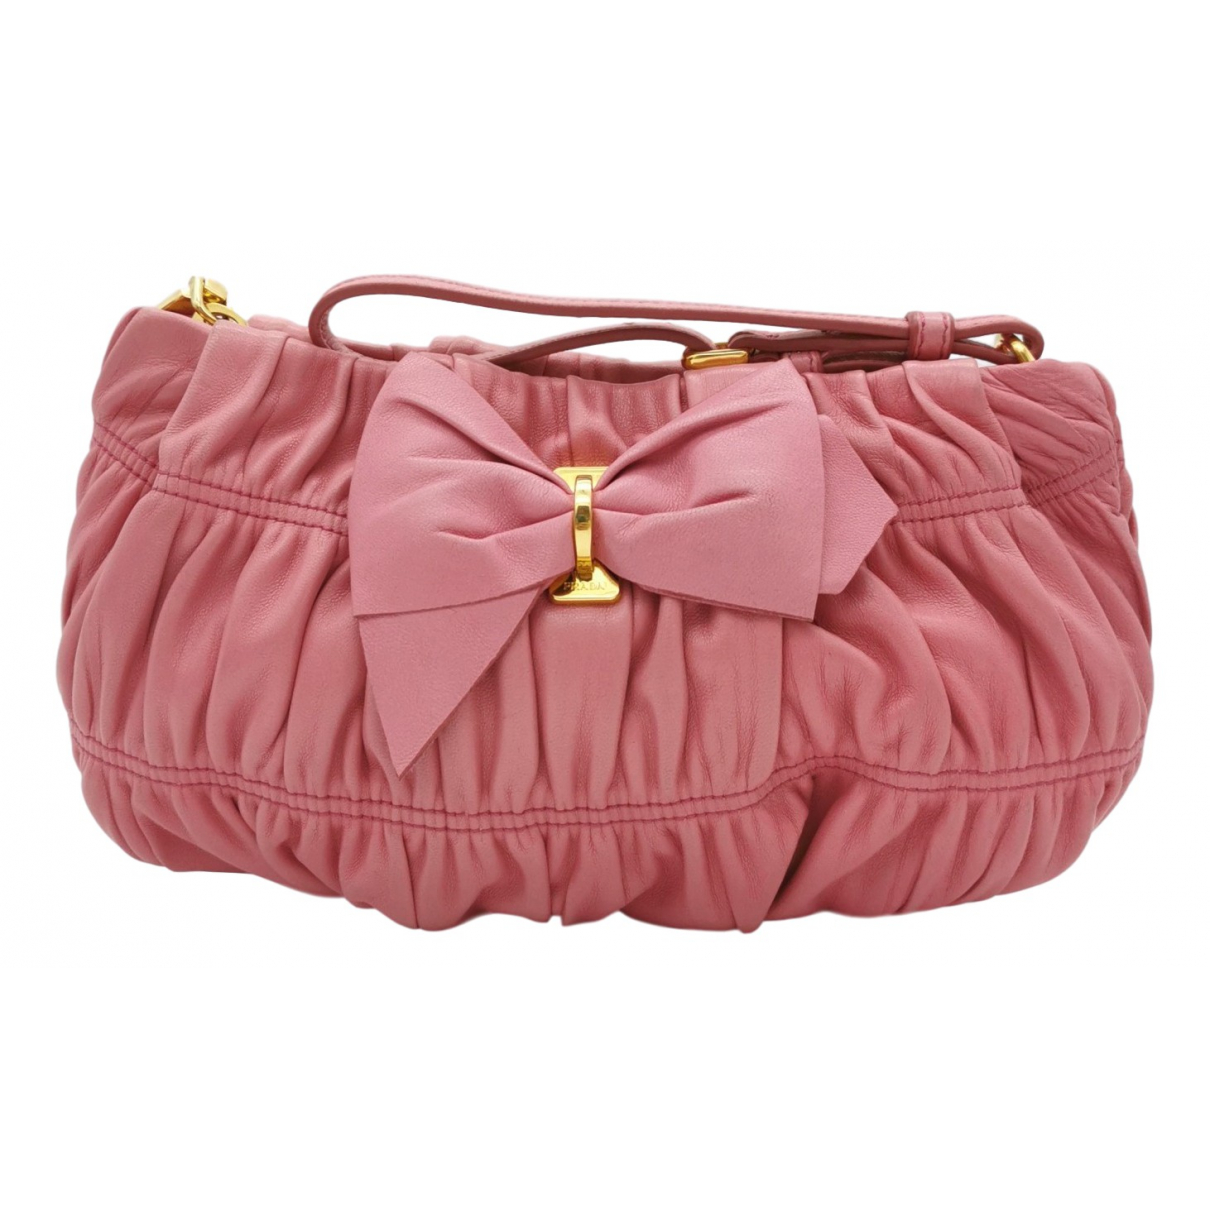 Prada N Pink Leather Clutch bag for Women N